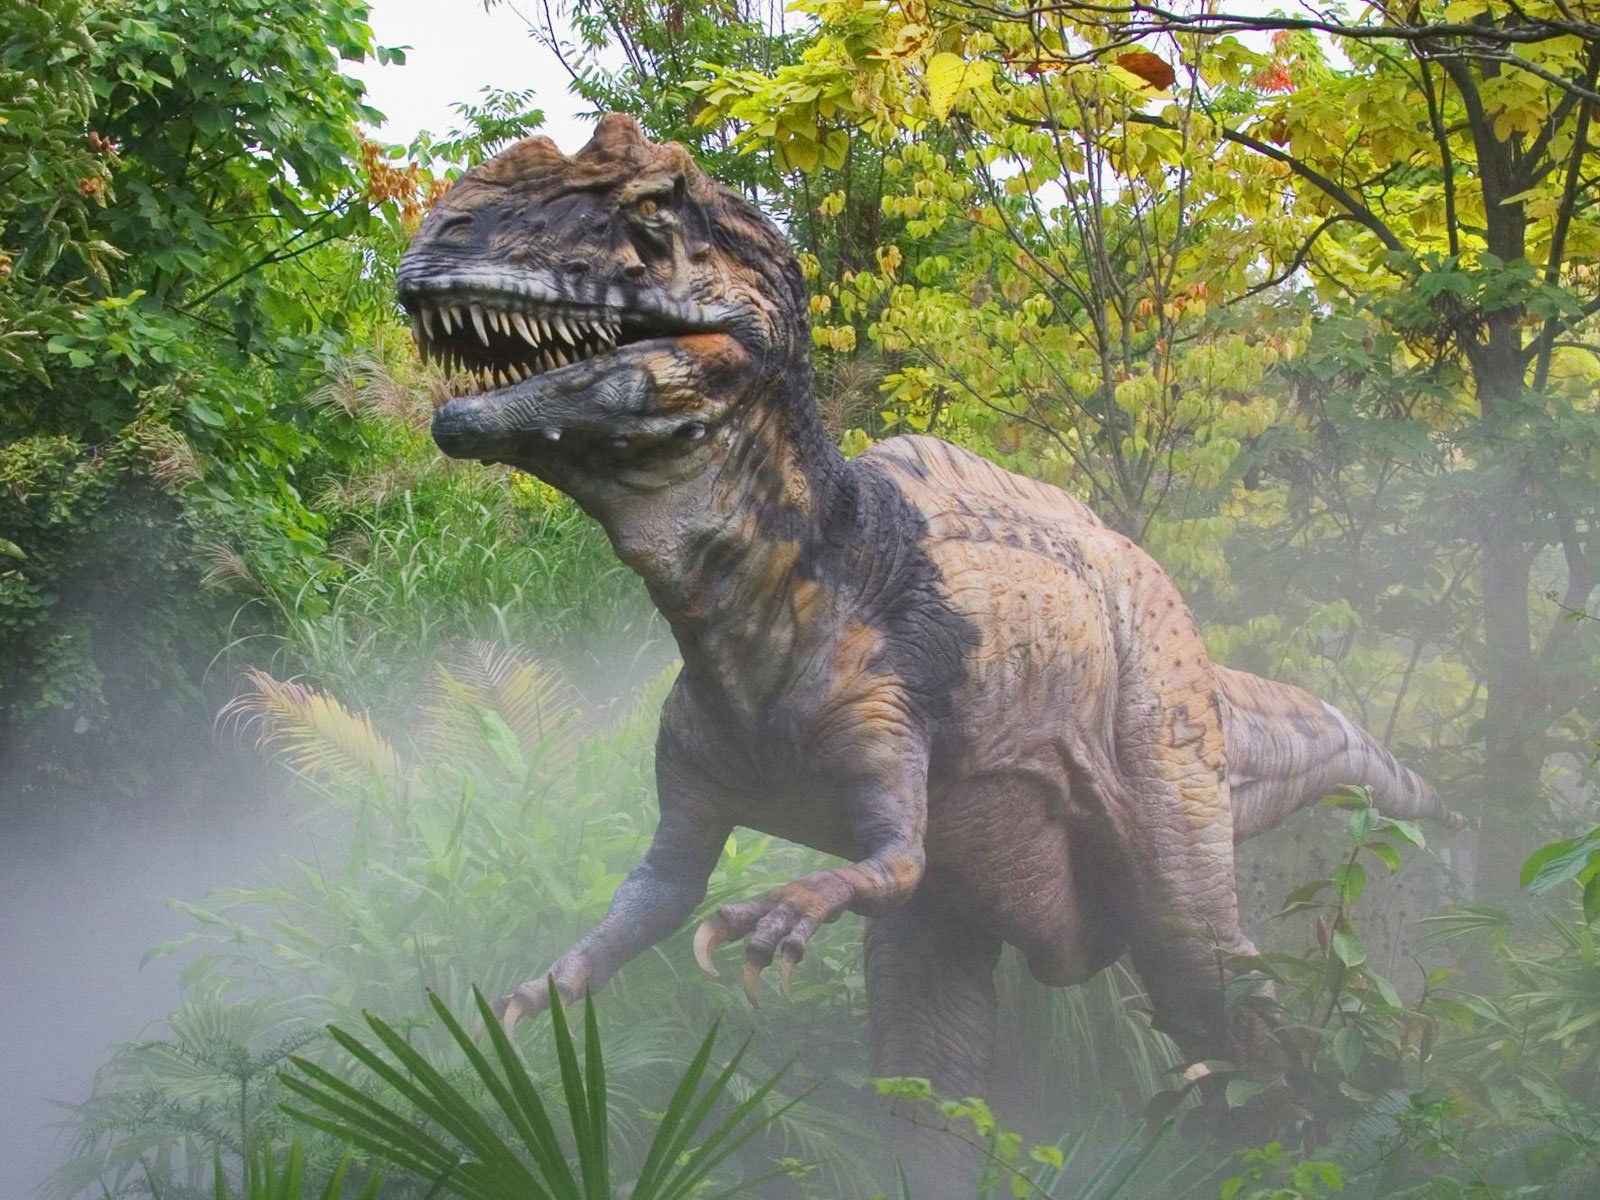 Poze cu dinozauri 3d cool dinosaur wallpaper Wallpapereorg 1600x1200